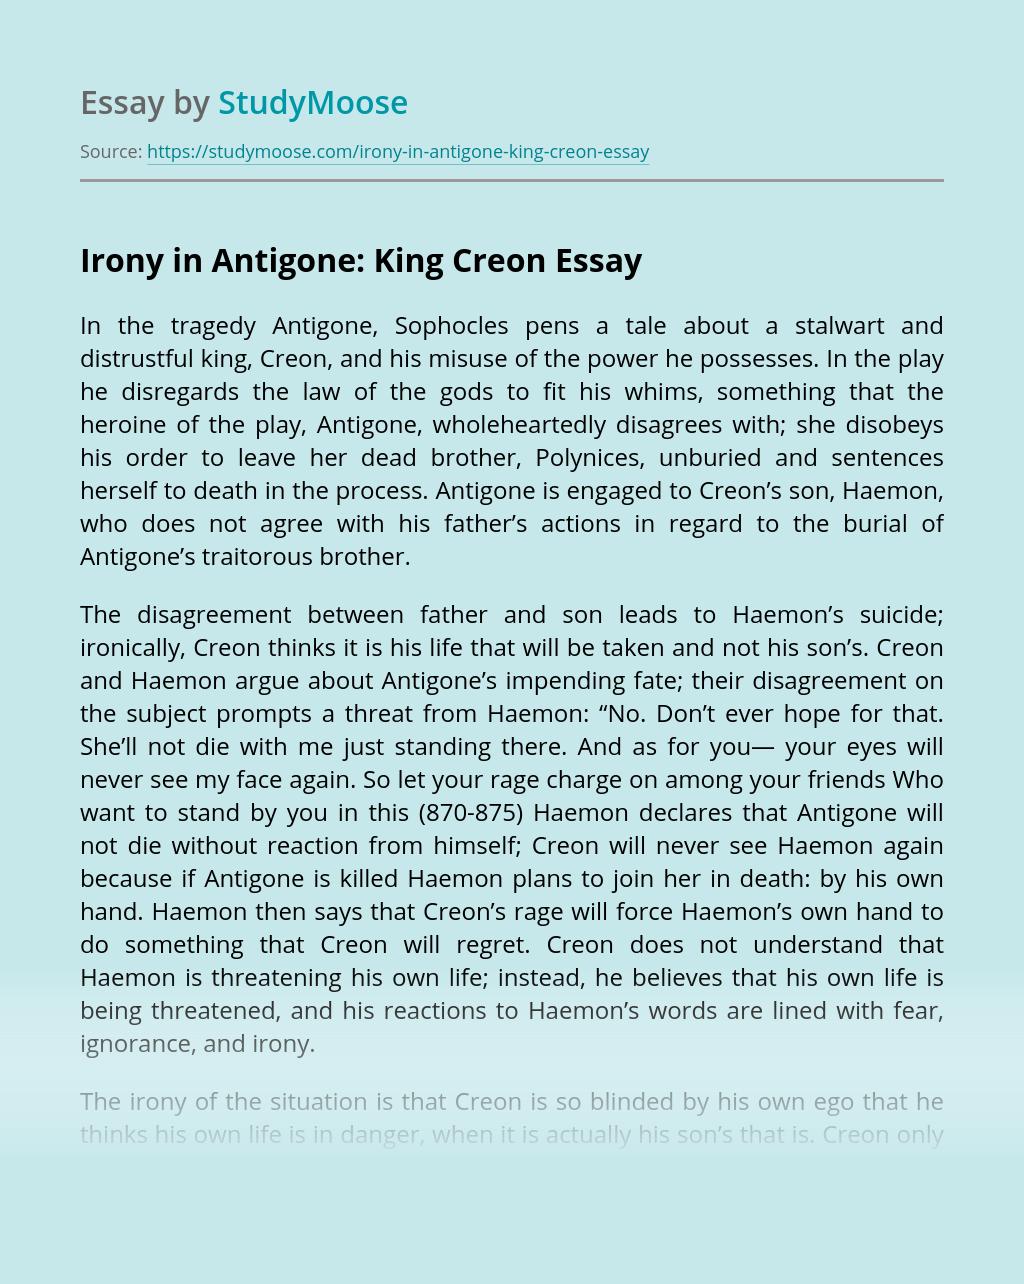 Irony in Antigone: King Creon